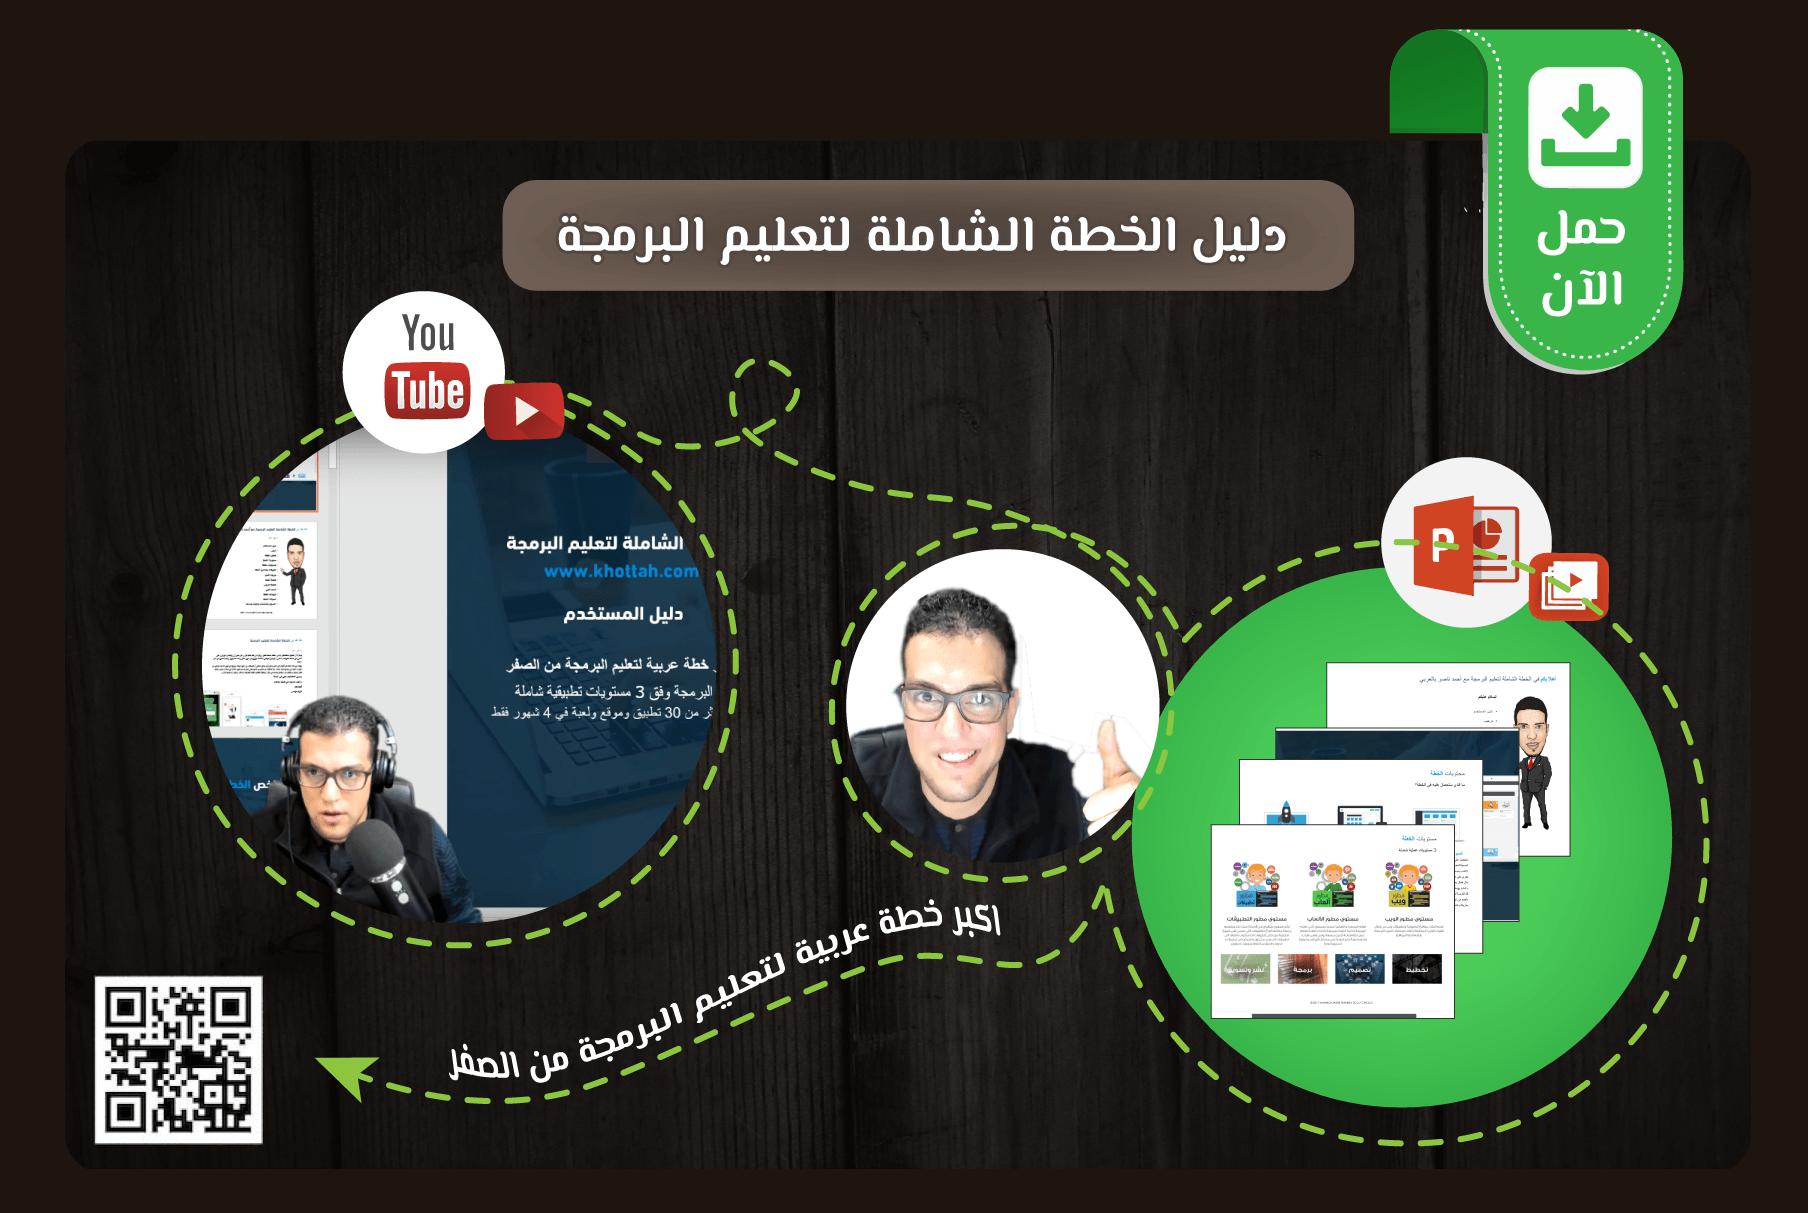 Photo of الخطة الشاملة لتعليم البرمجة – الدليل الشامل khottah guide